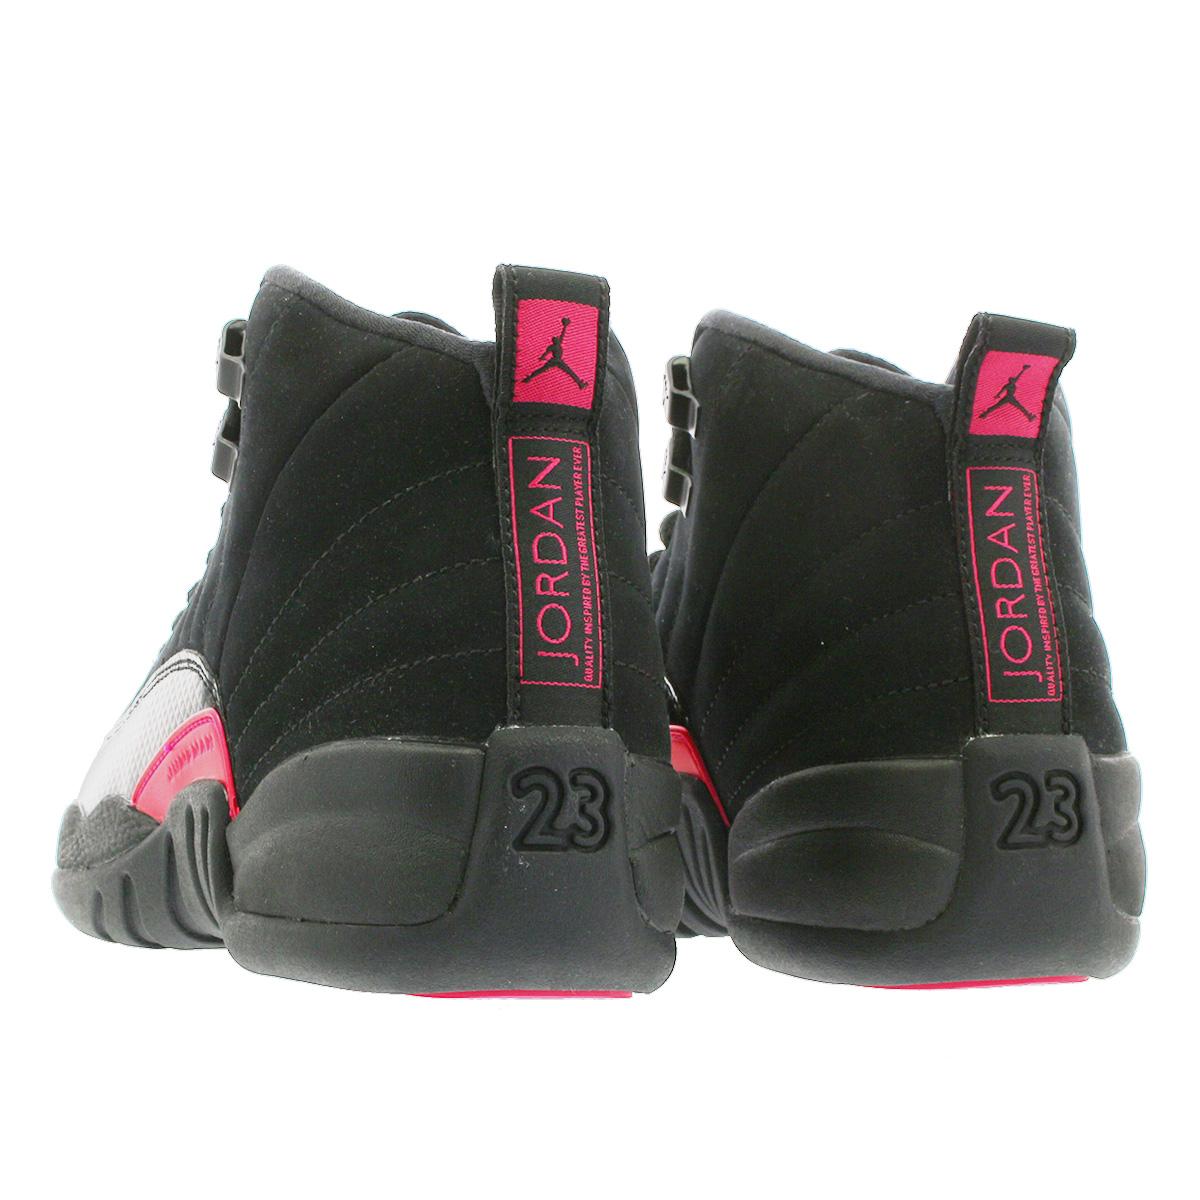 on sale df201 6d9be NIKE AIR JORDAN 12 RETRO GG Nike Air Jordan 12 nostalgic GG BLACK DARK GREY RUSH  PINK 510,815-006